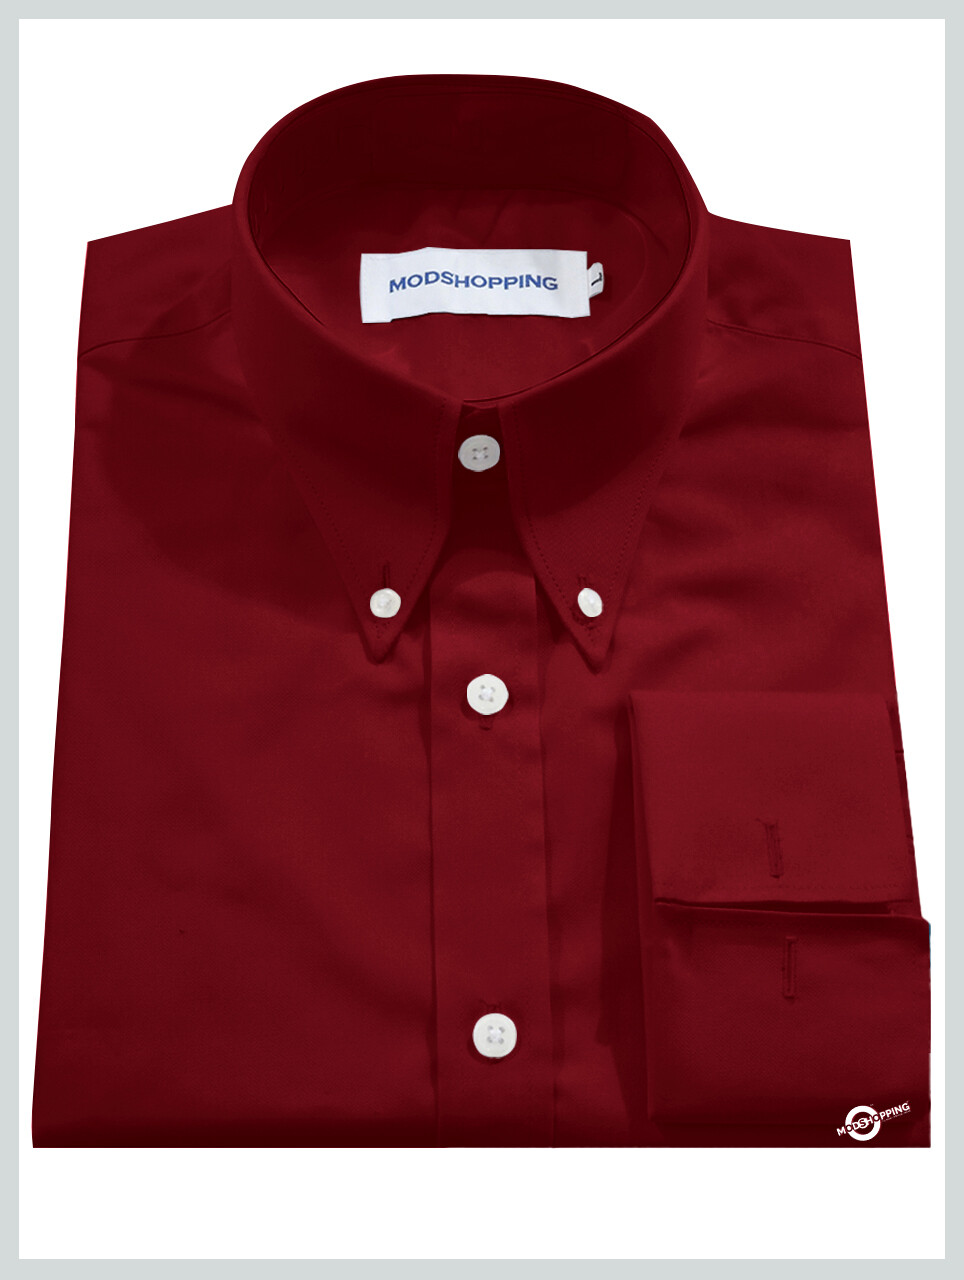 High Collar Red Shirt| Formal Shirts For Men